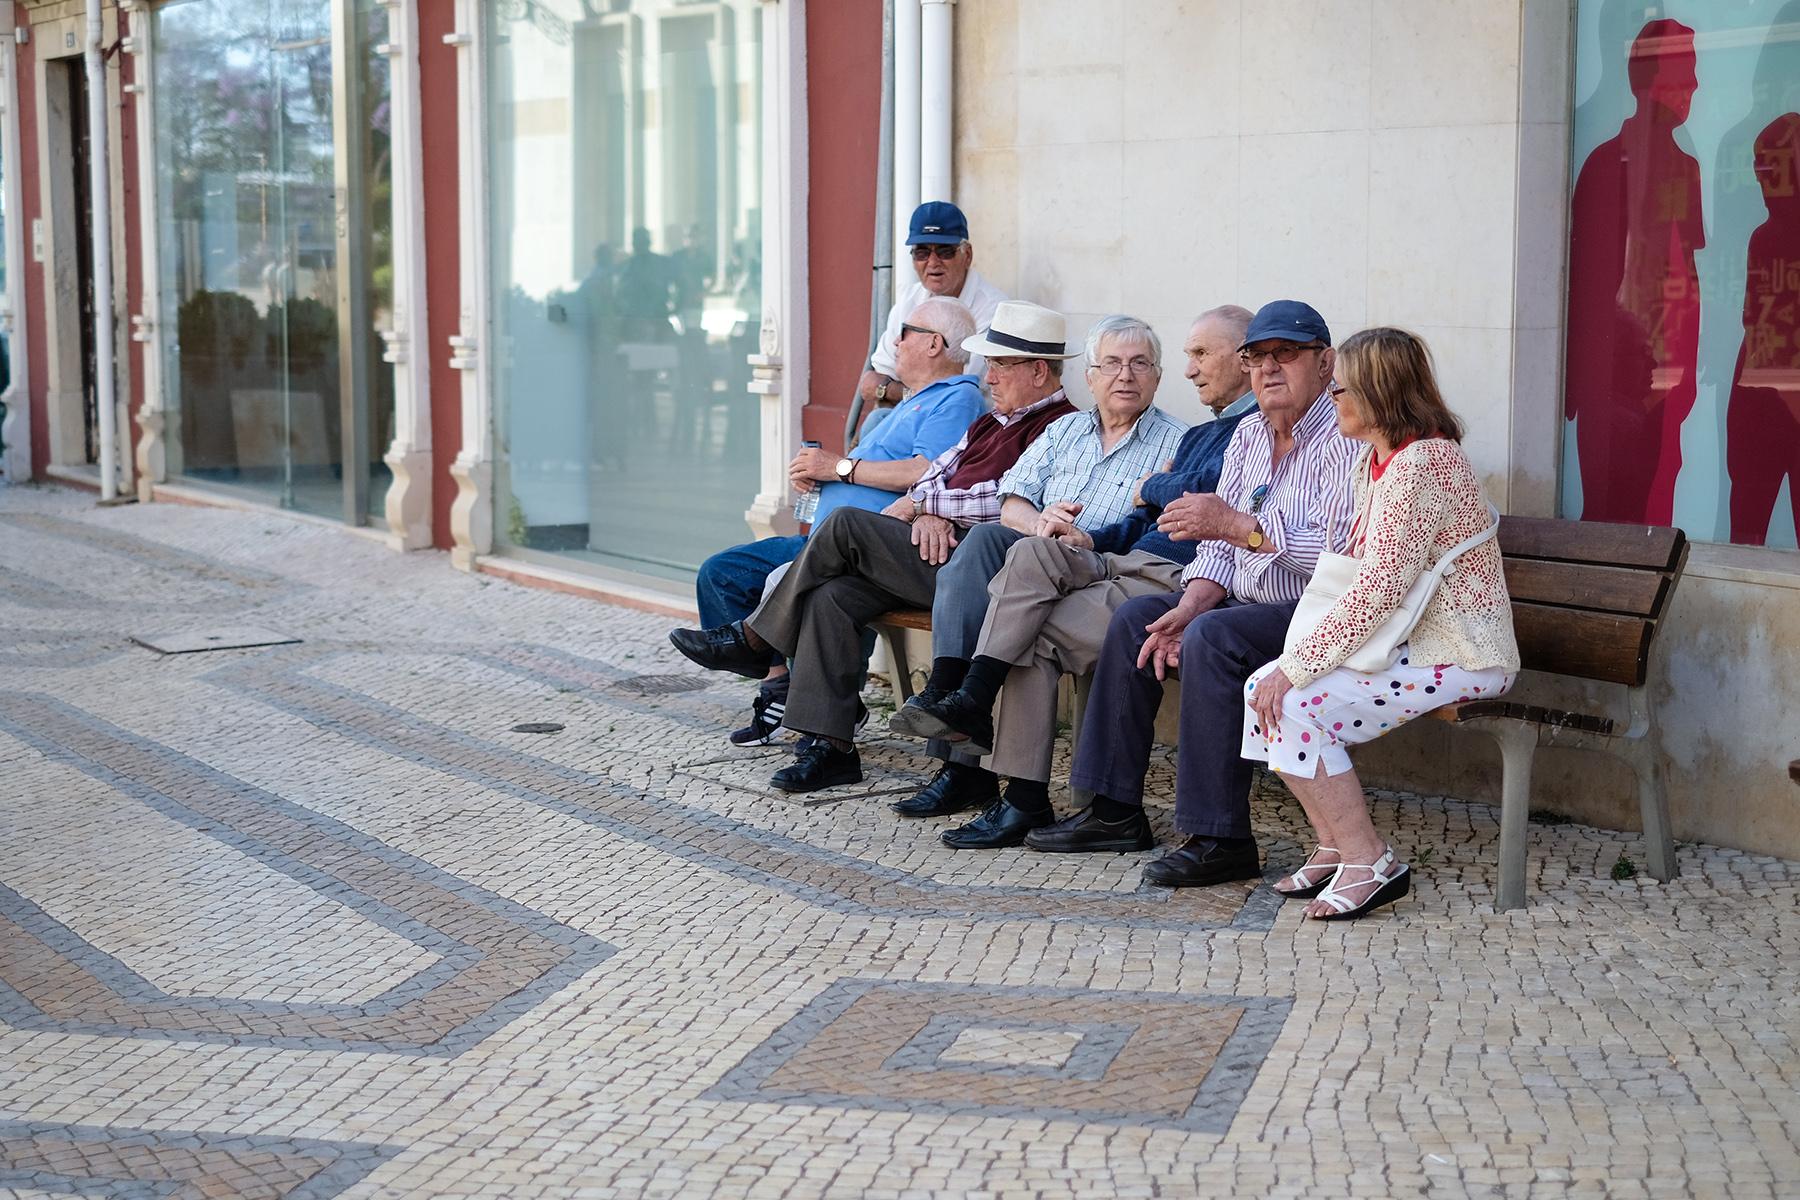 Portuguese pension system